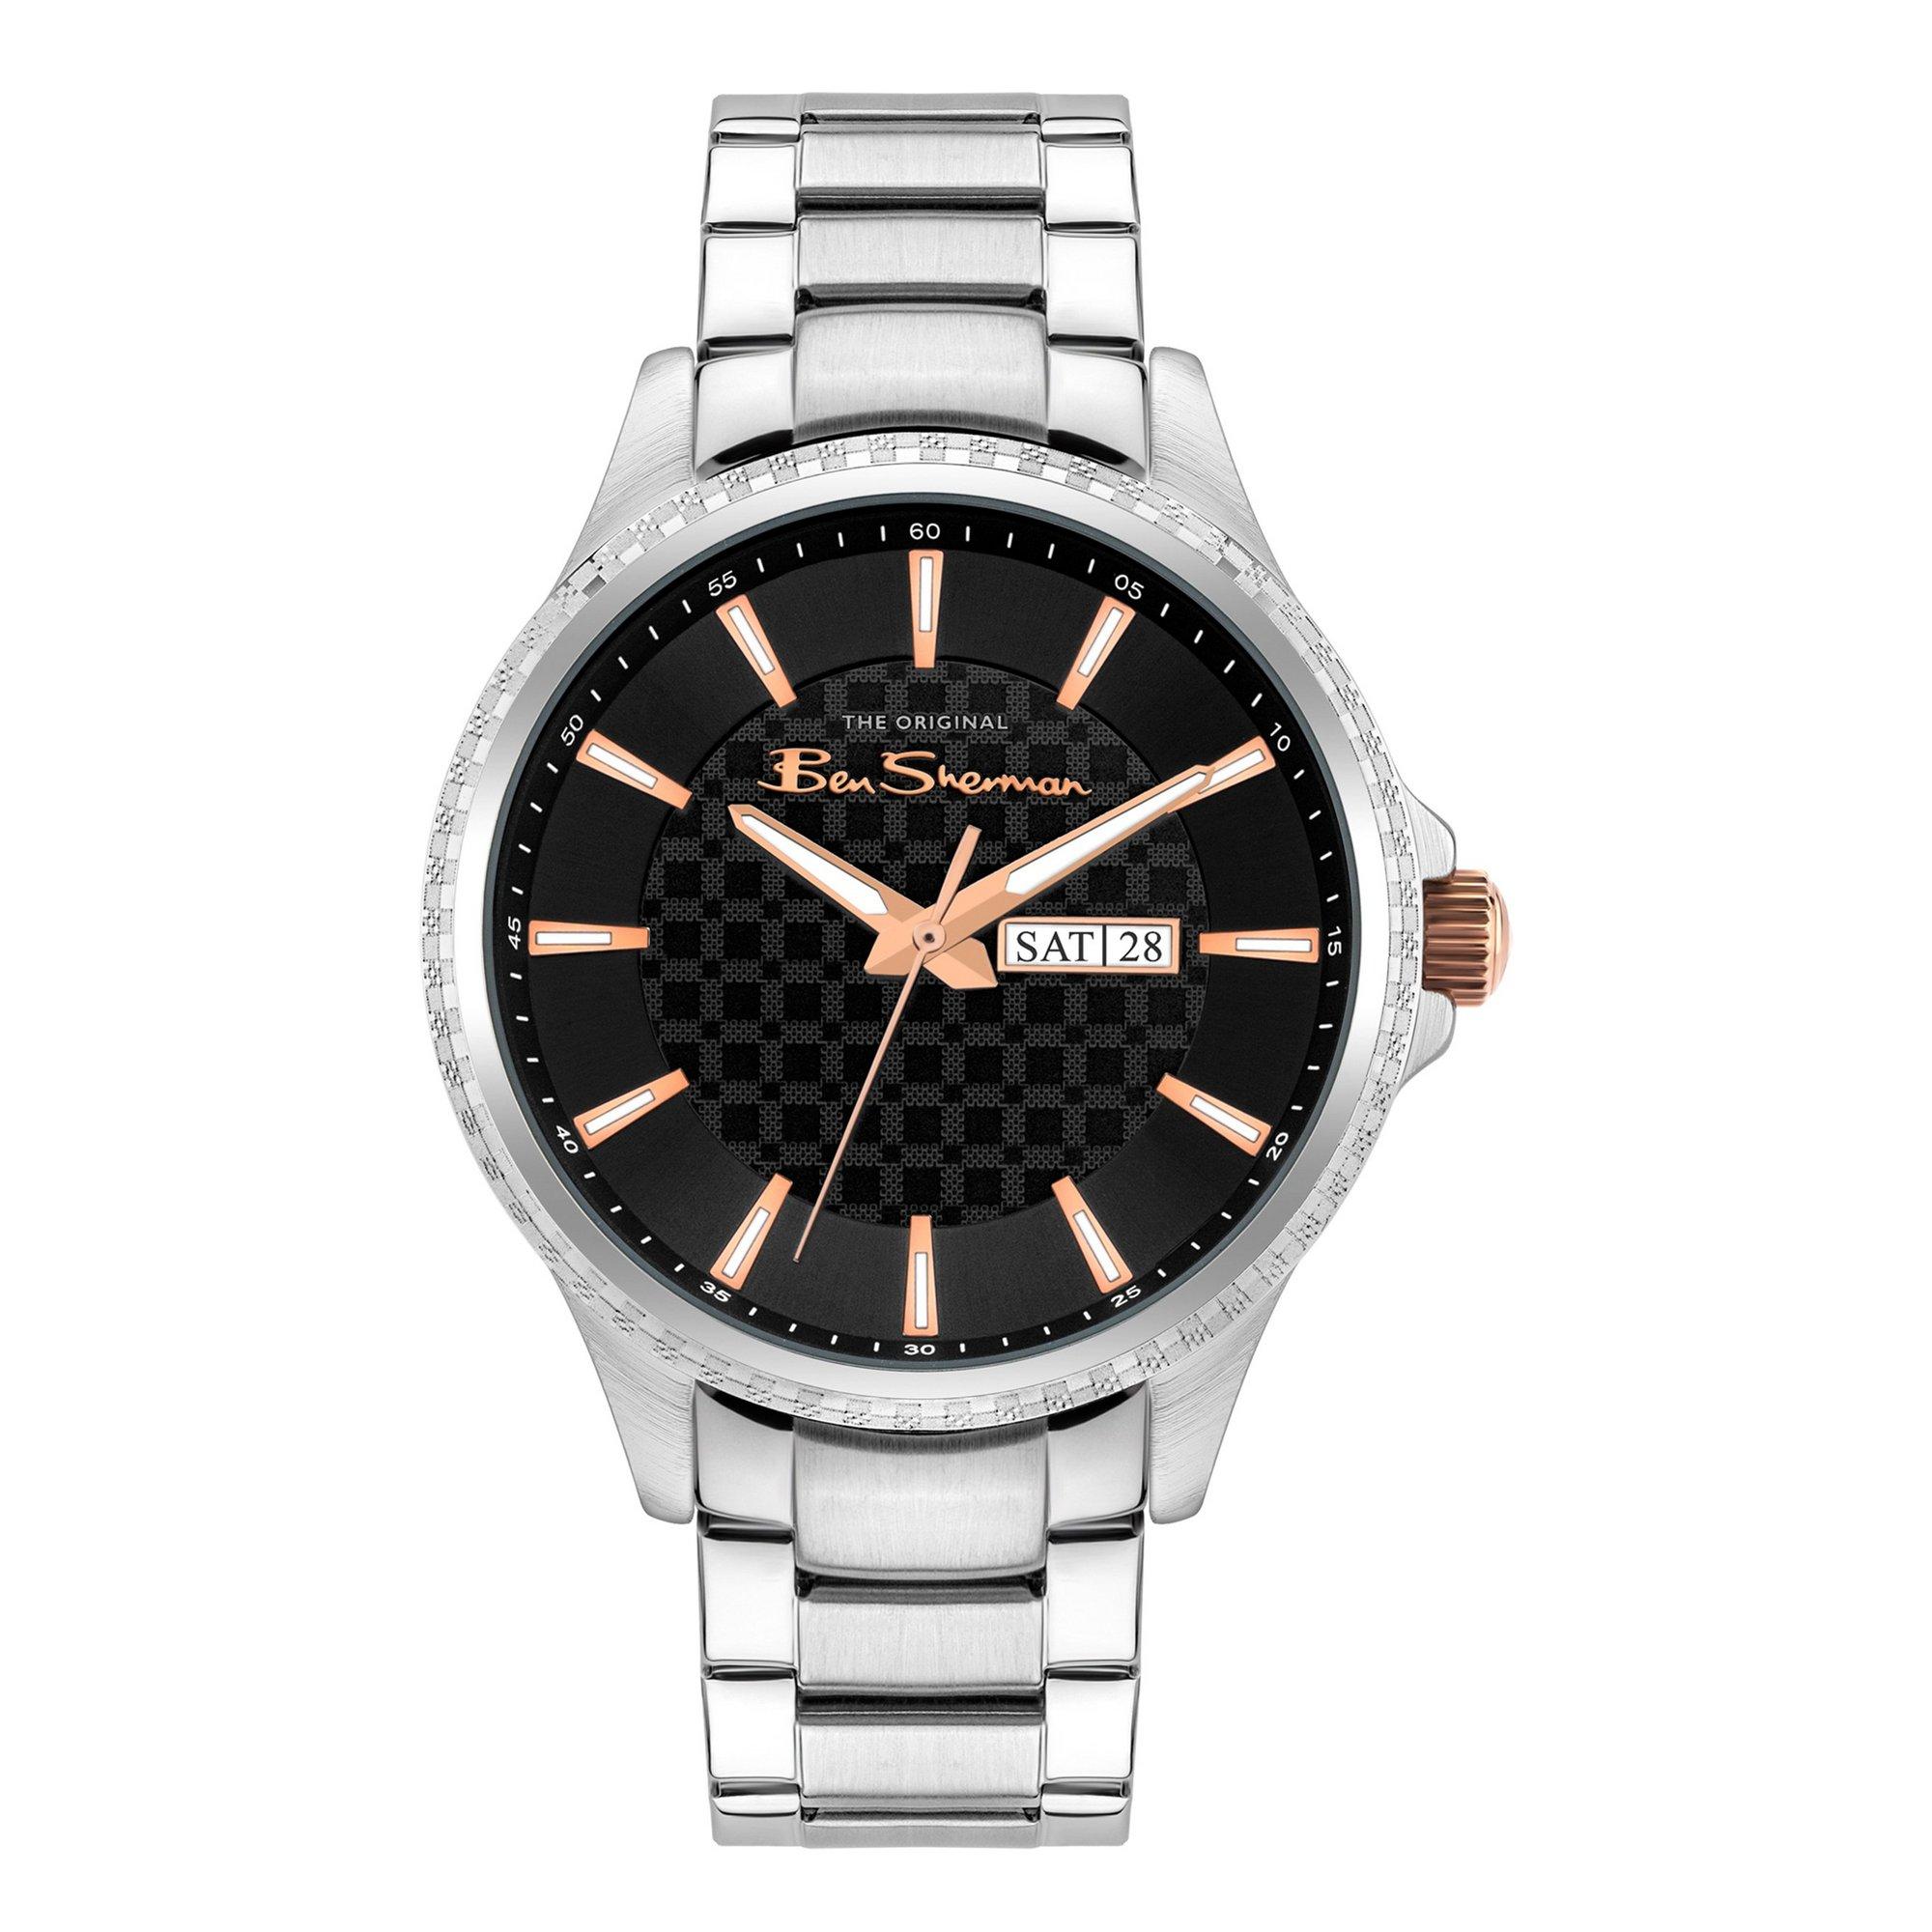 Image of Ben Sherman Silver Bracelet Watch with a Black Dial